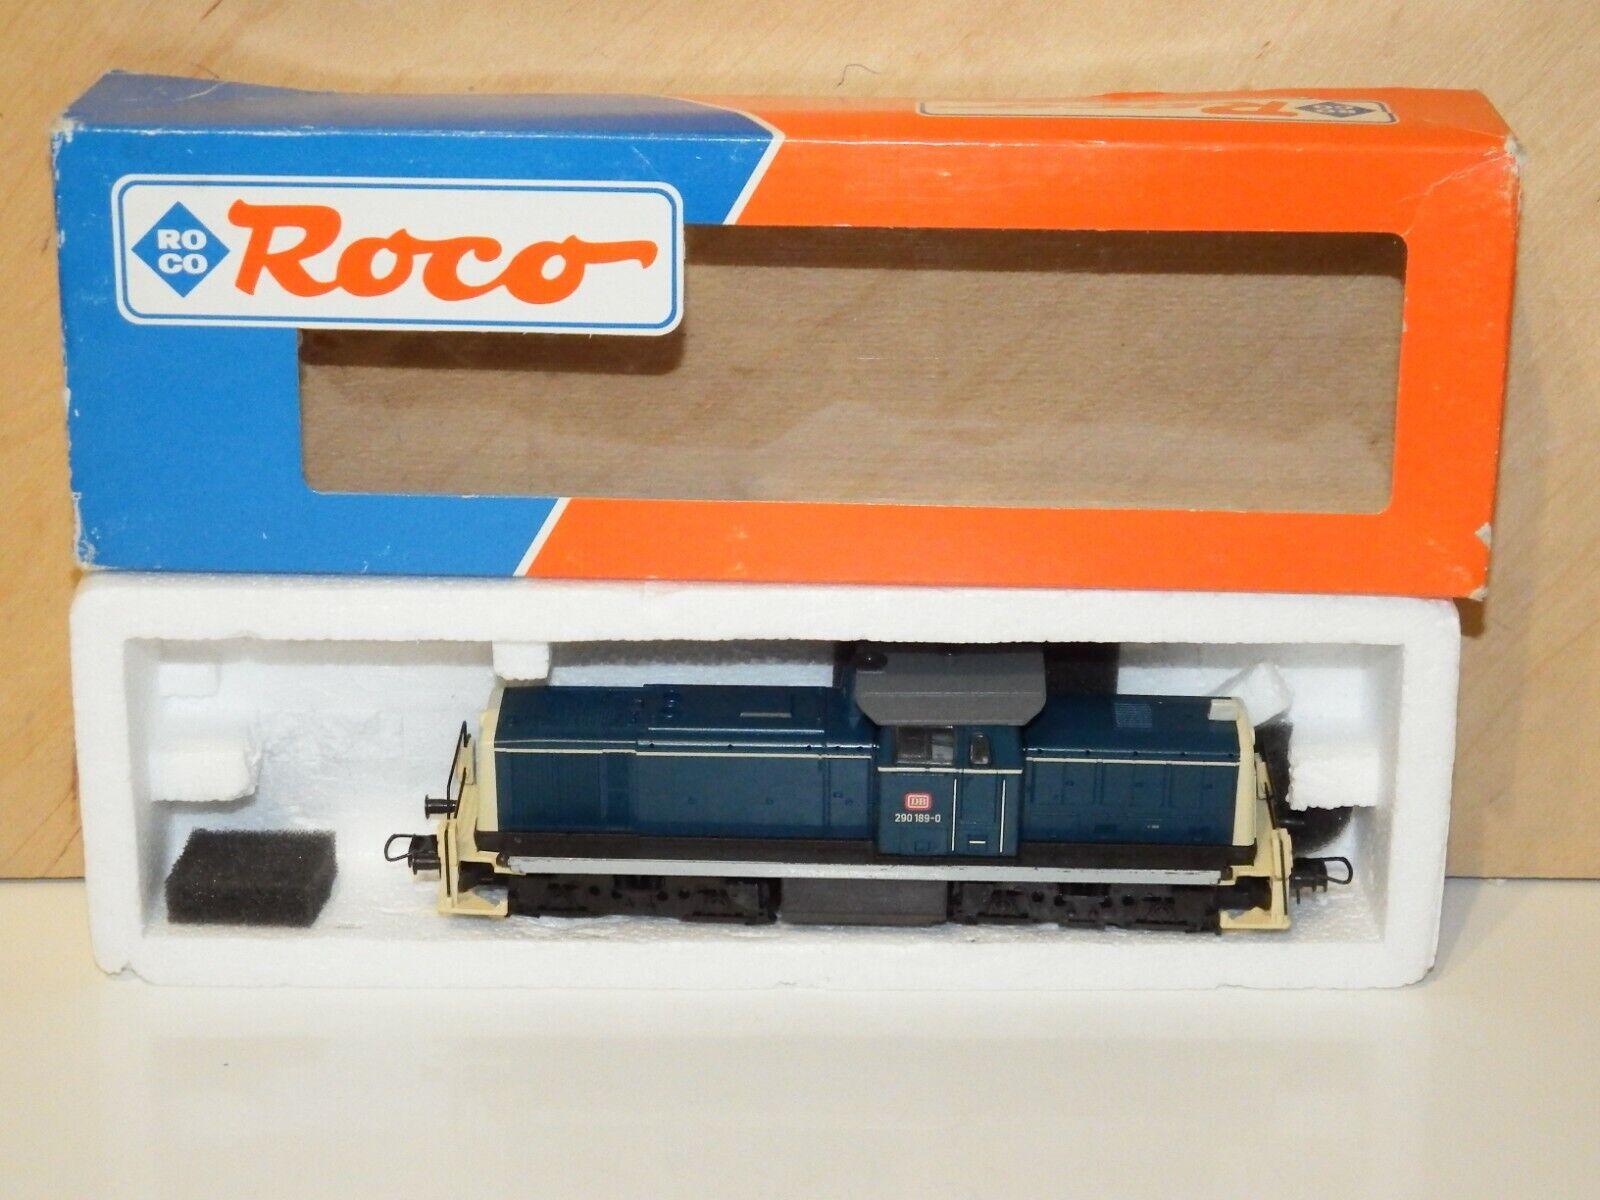 H0 Roco 67875 DSS Diesellok DB BR 290 189-0 not original box 8184